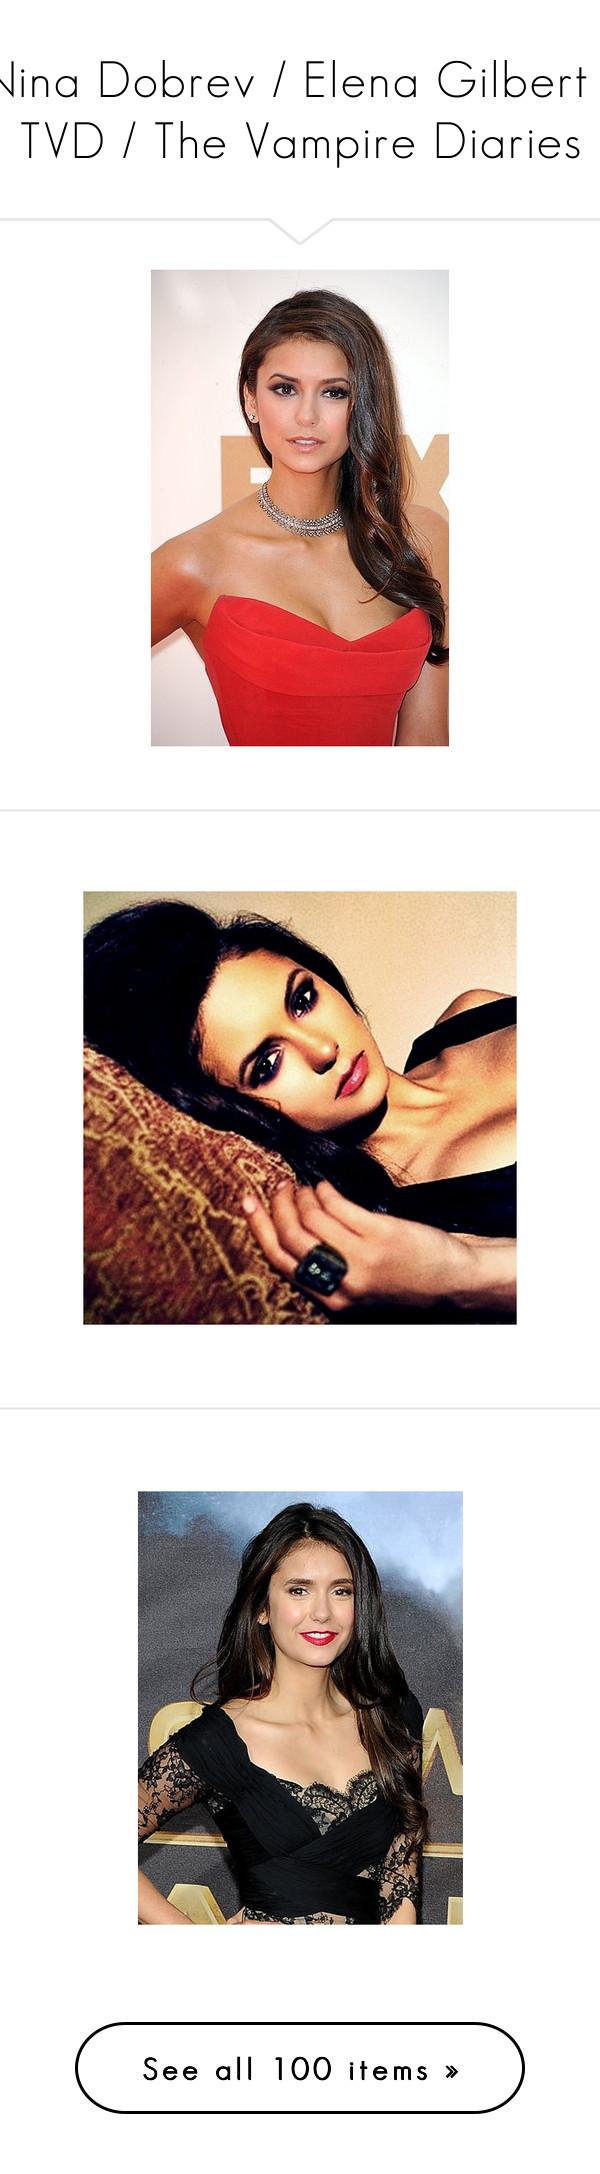 """Nina Dobrev / Elena Gilbert / TVD / The Vampire Diaries"" by annafilipa ❤ liked on Polyvore featuring nina dobrev, vampire diaries, backgrounds, girls, models, celebrities, people, the vampire diaries, home and home decor"